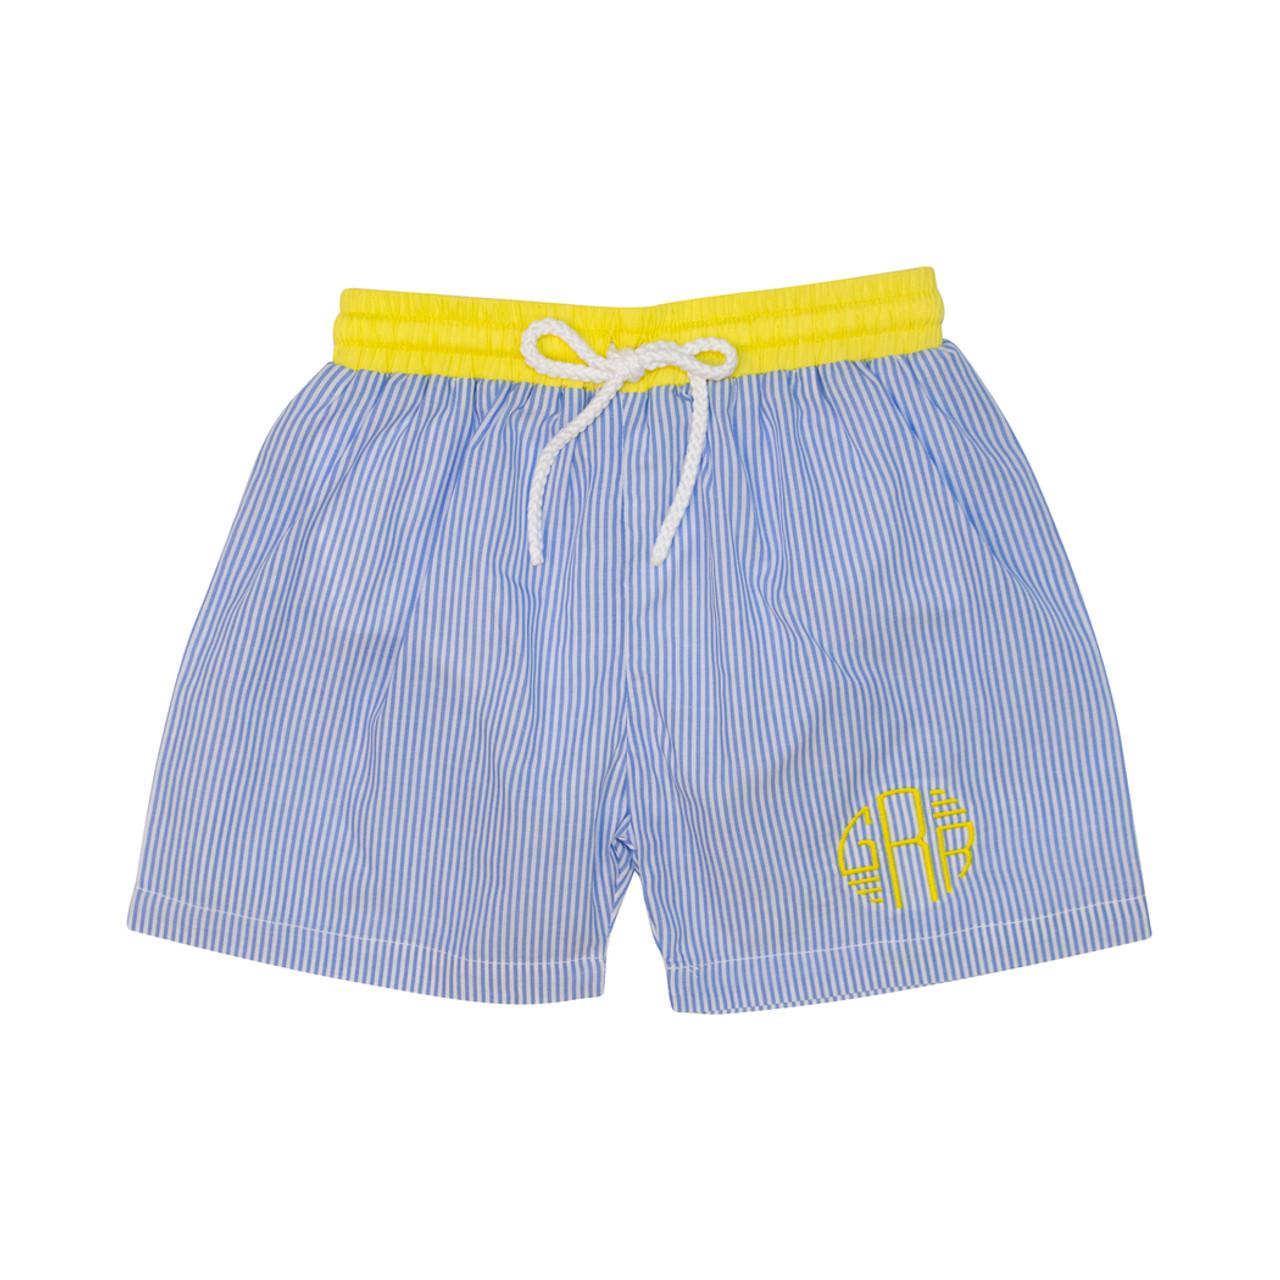 67fe6e5d24 Blue Stripe Yellow Trim Swim Trunks - Cecil and Lou